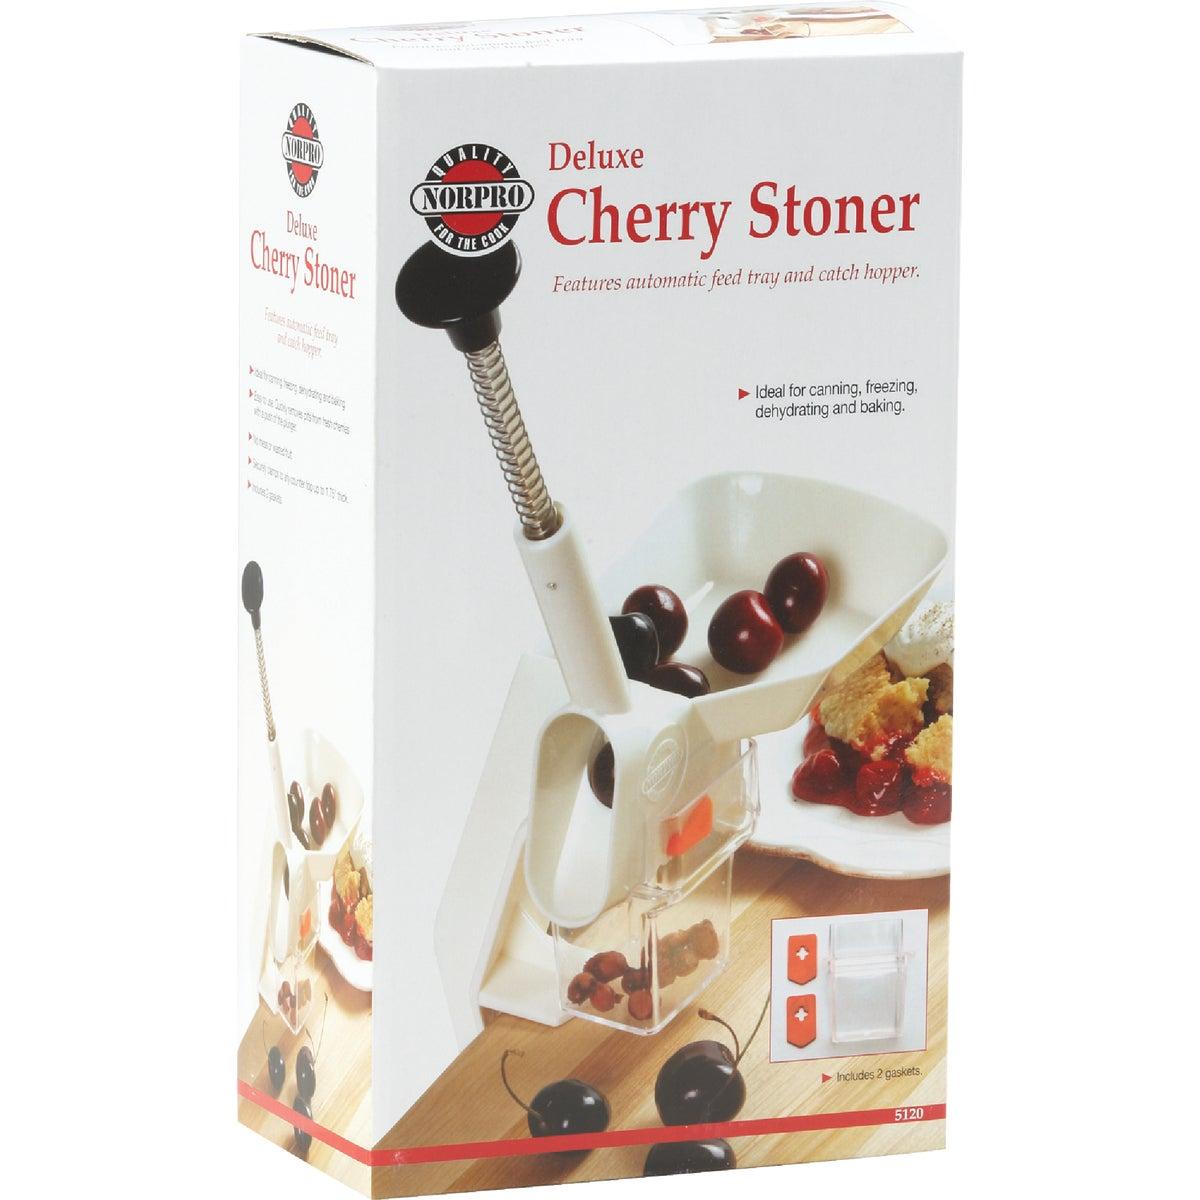 CHERRY STONER